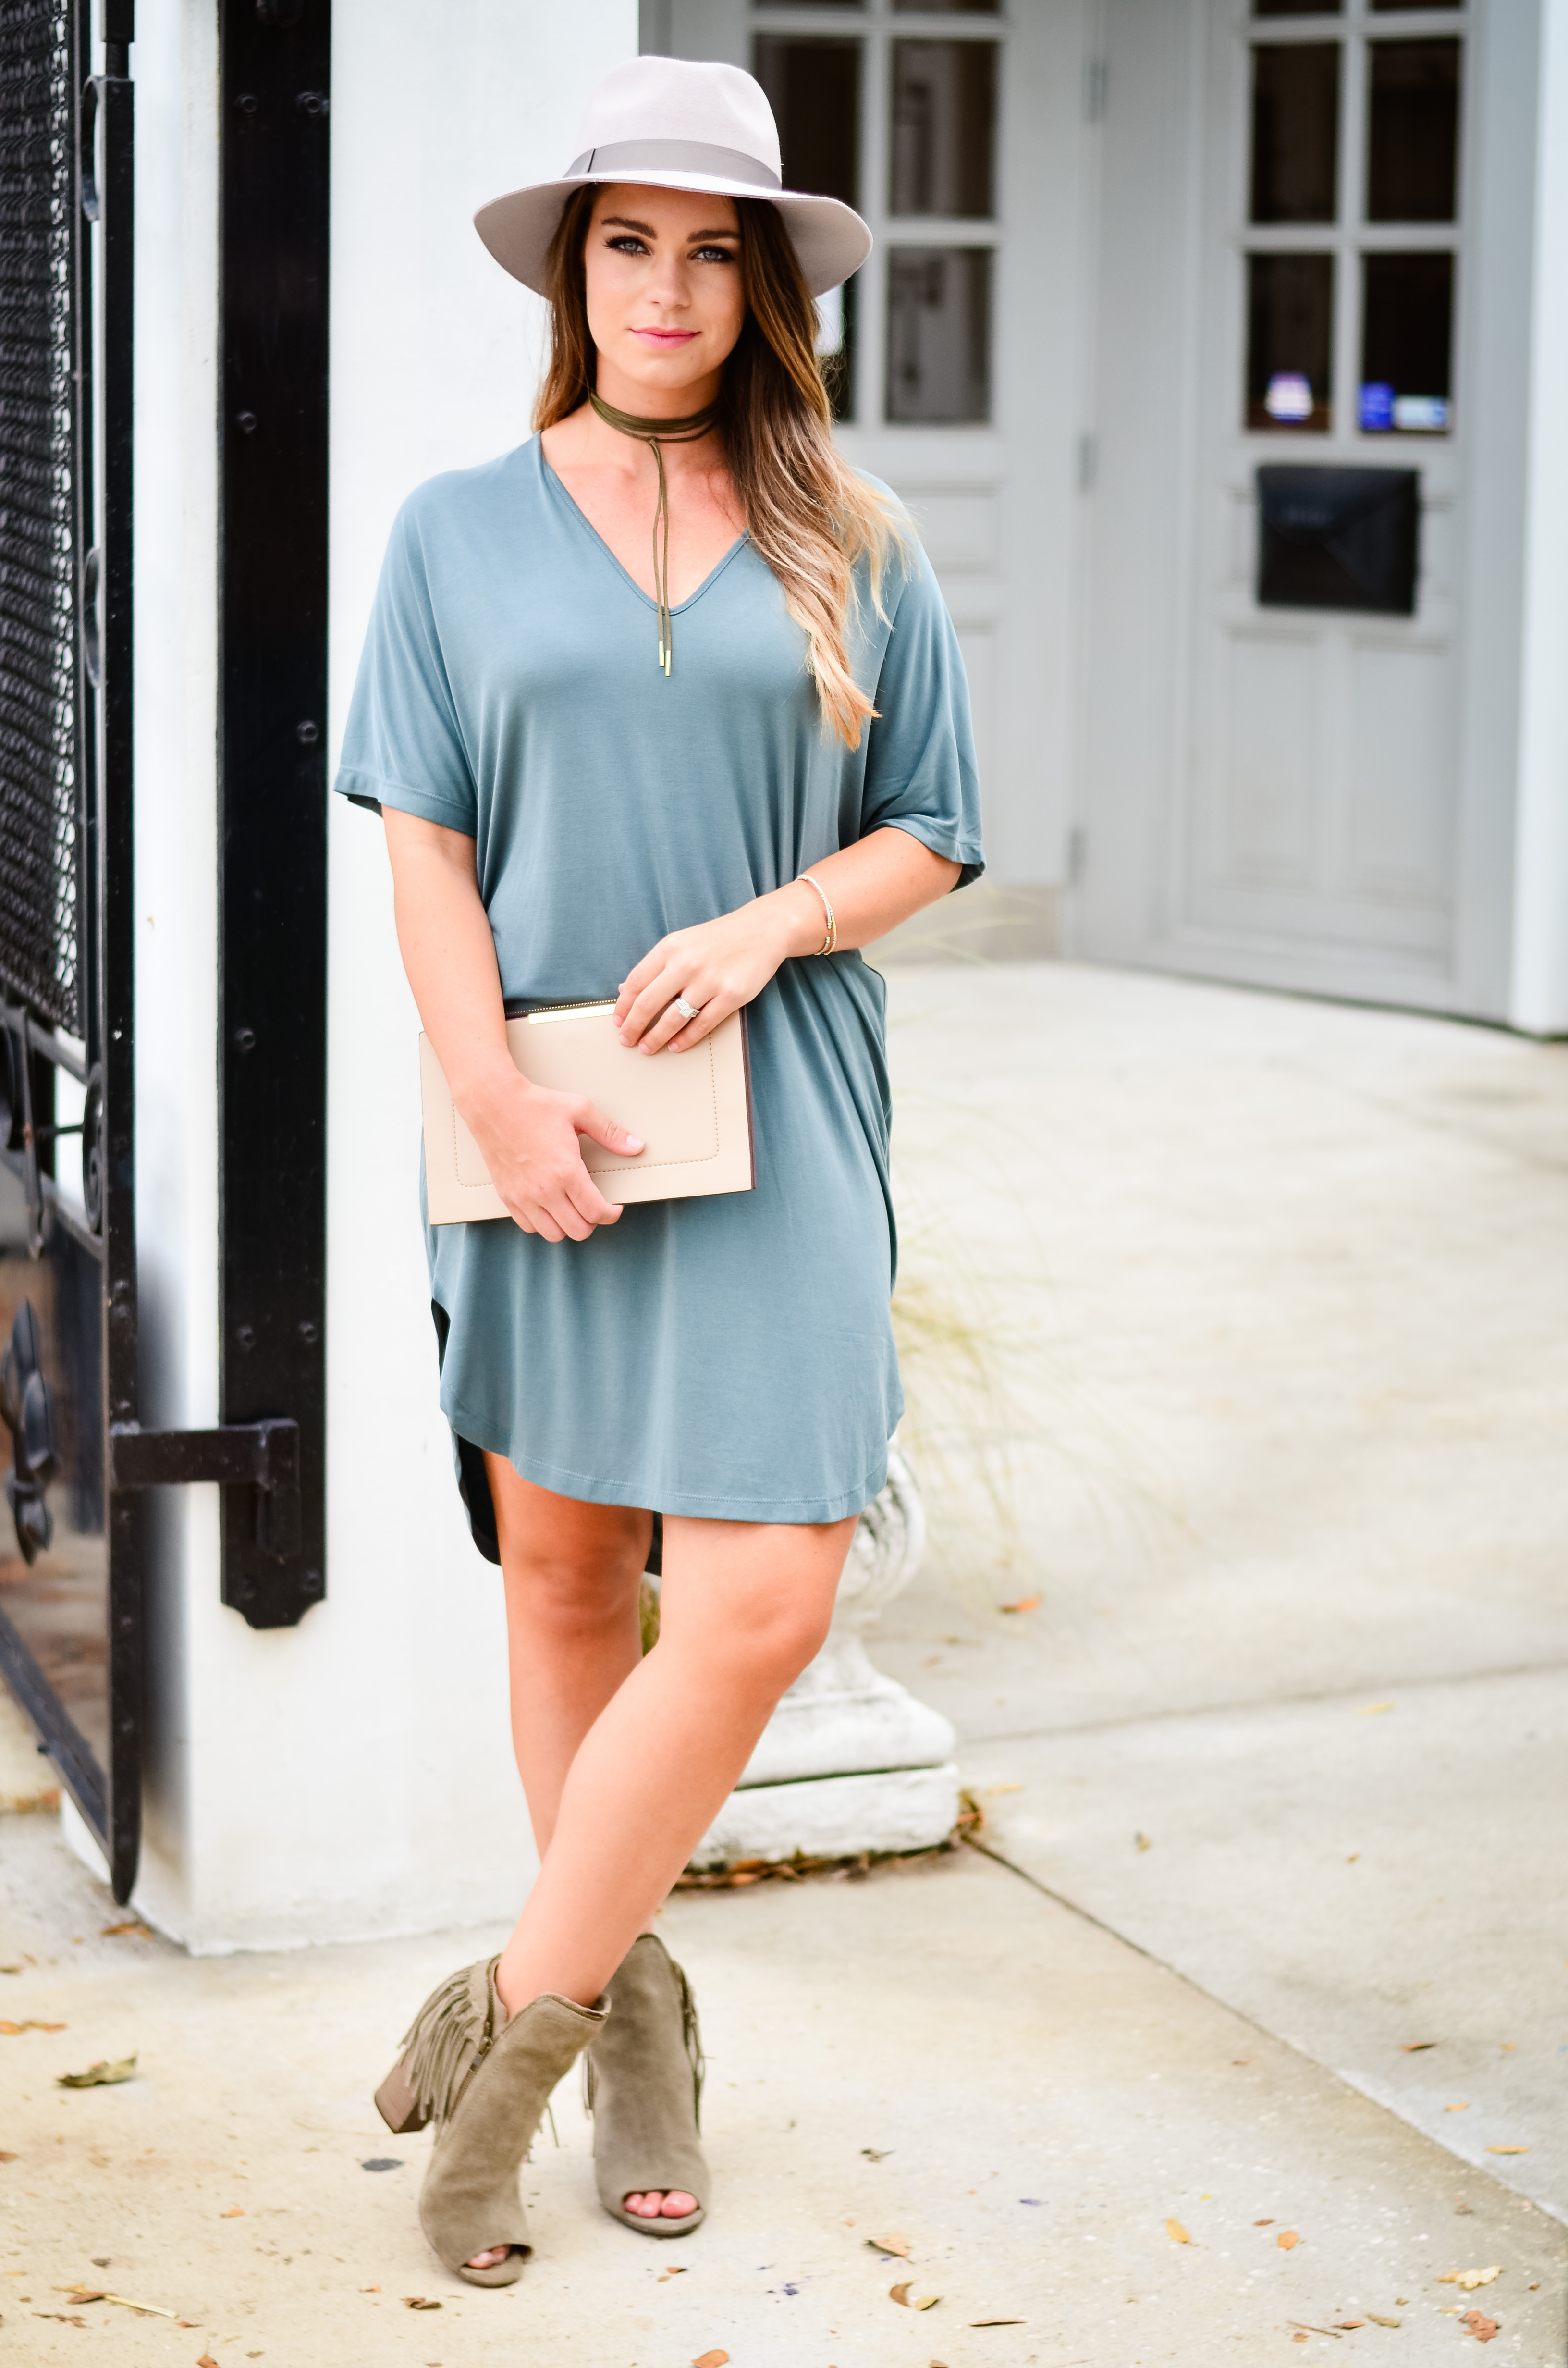 light-teal-dress-hat-booties-goldfinch-7